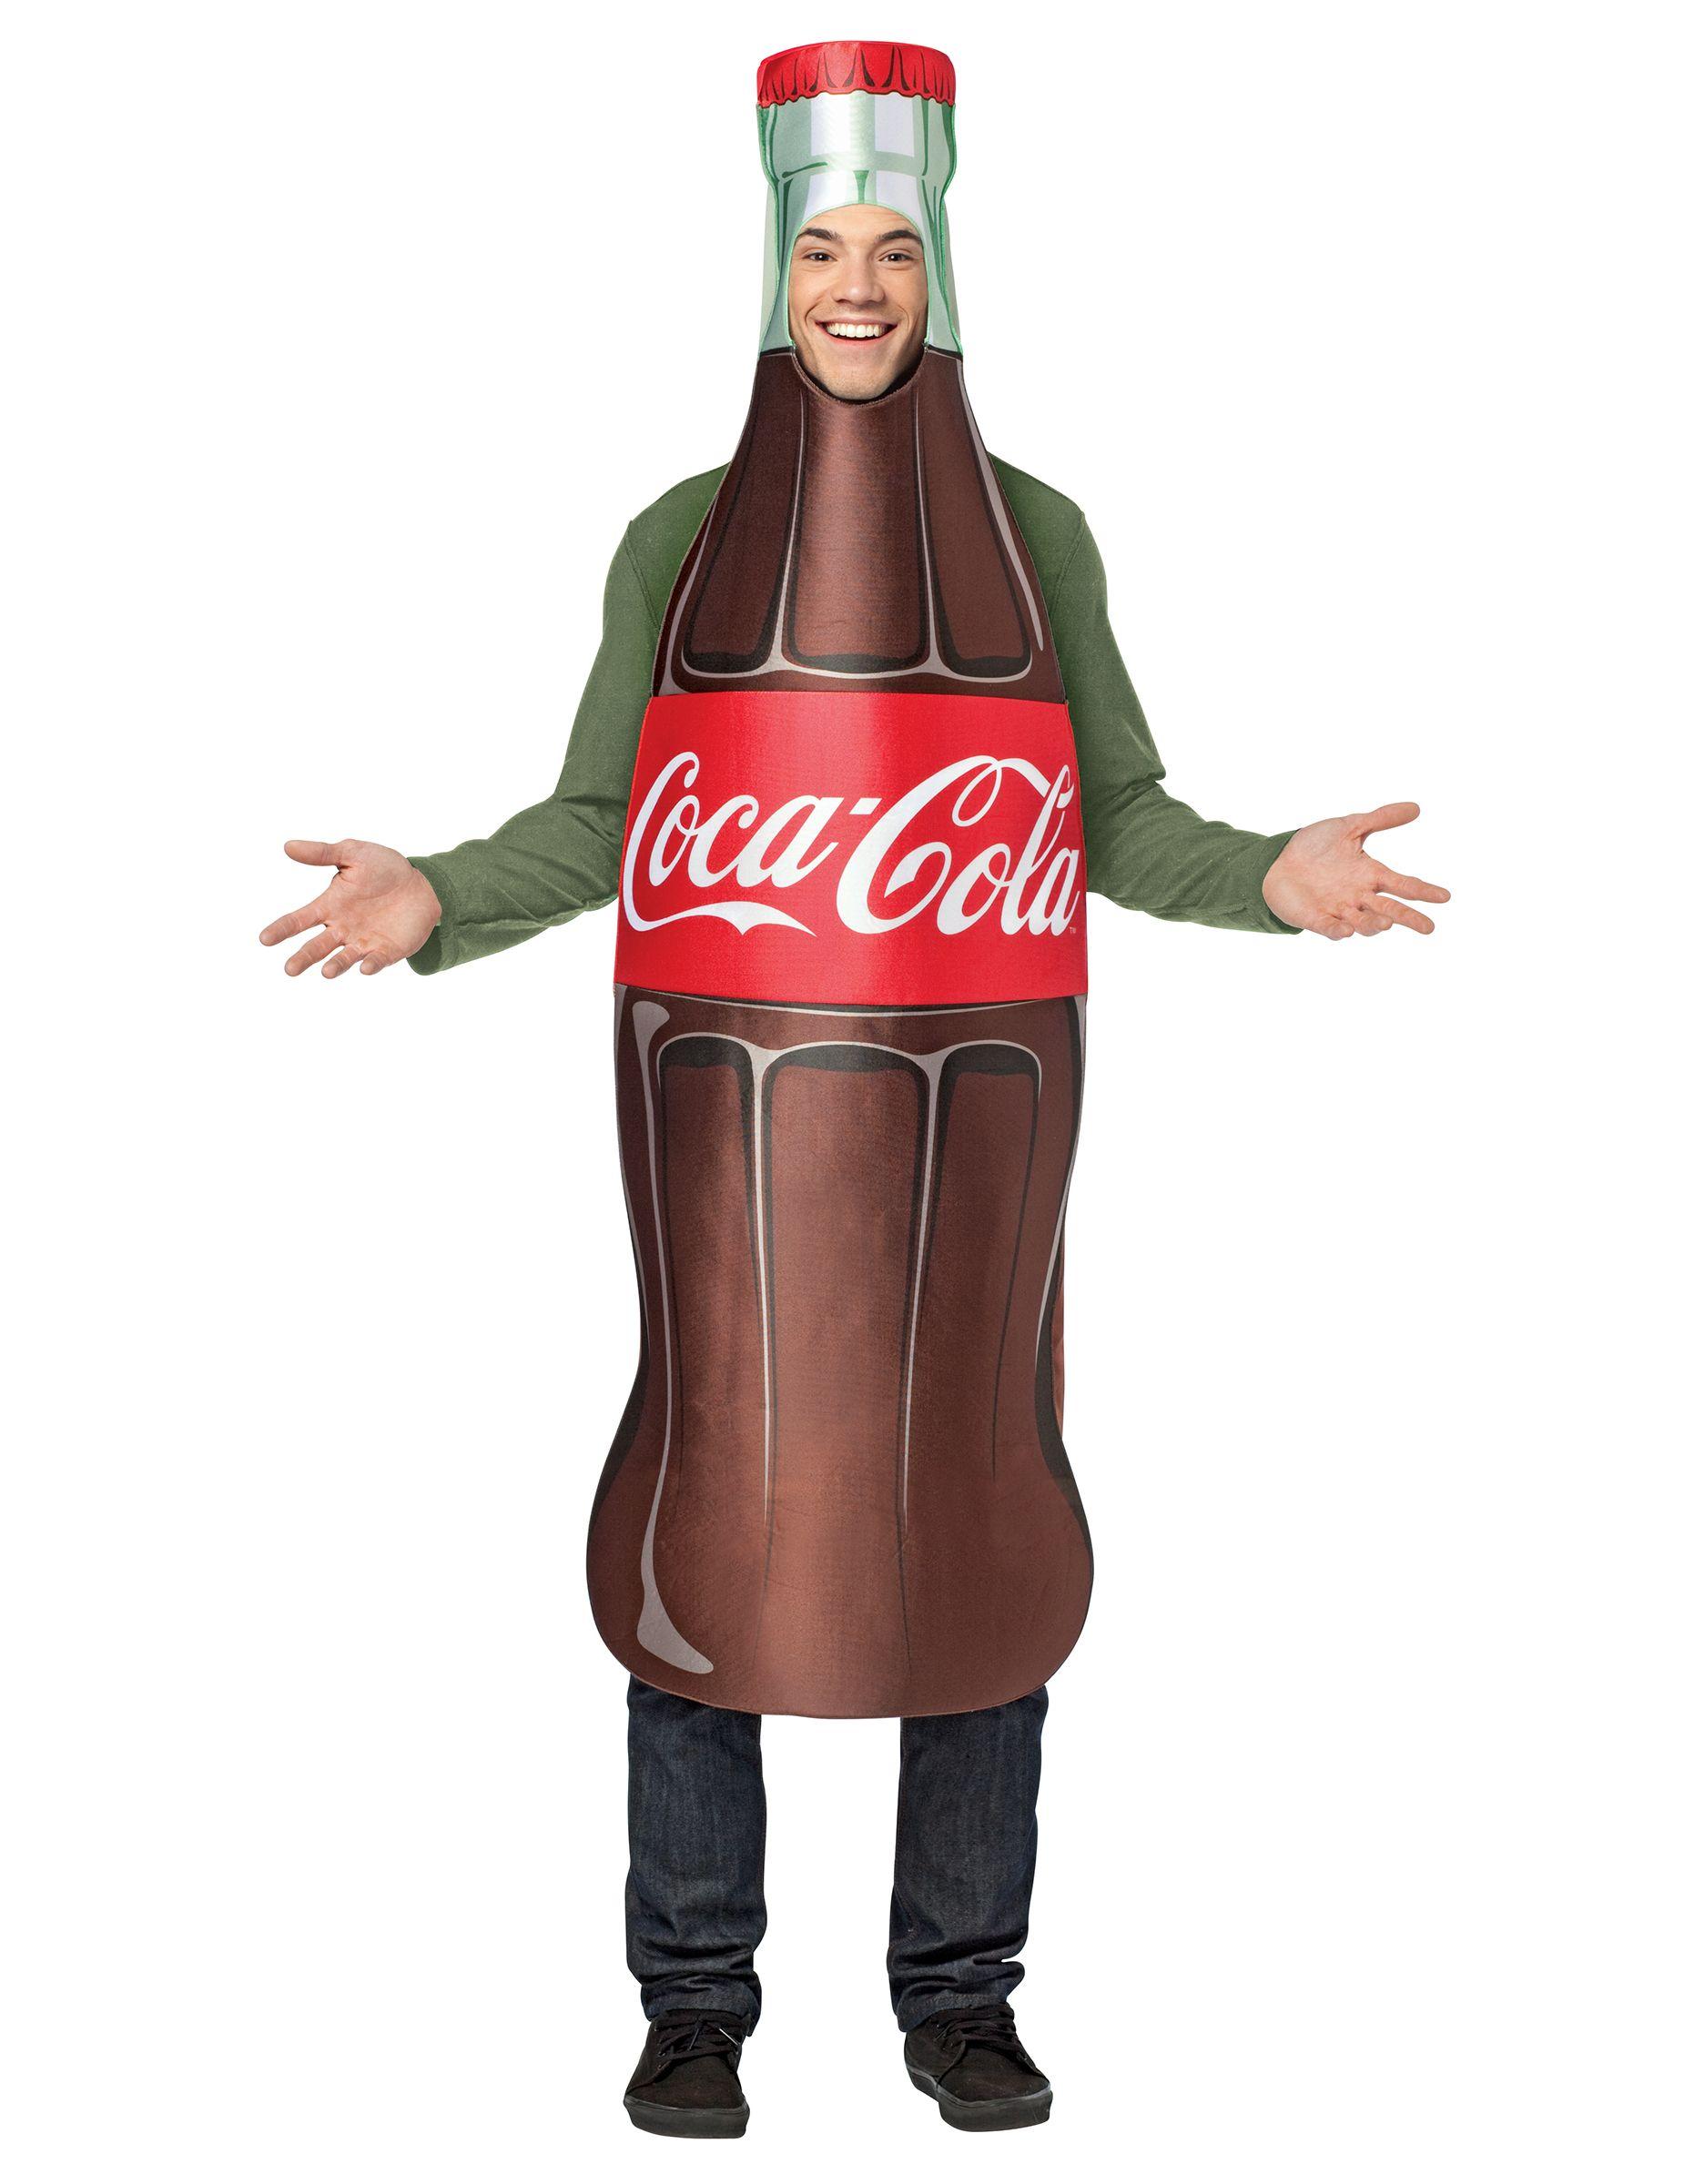 Прикольные картинки кока-кола, любимой бабушке